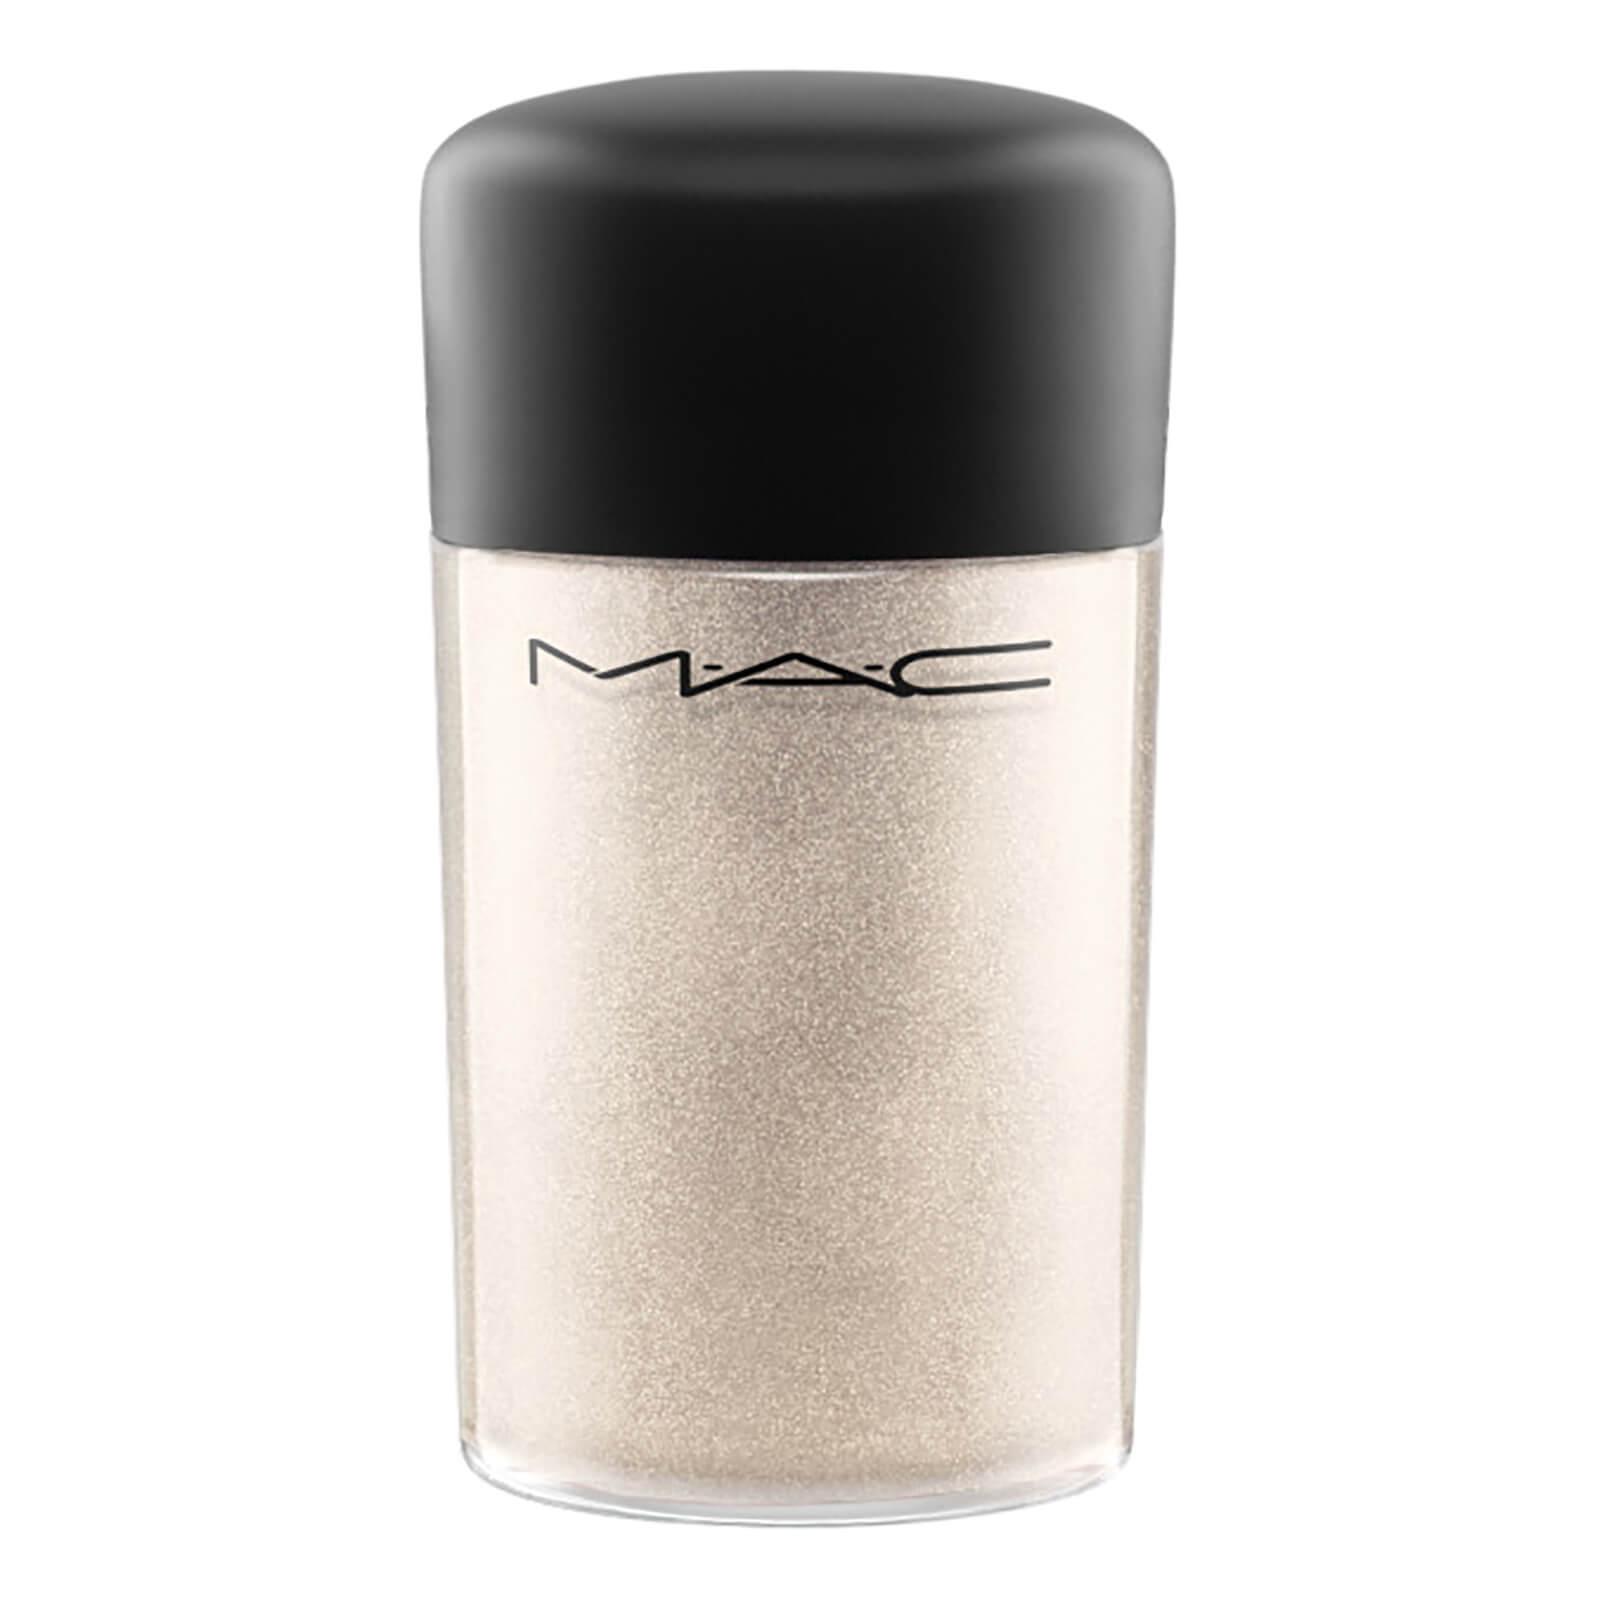 MAC Pigment Colour Powder (Various Shades) - Vanilla